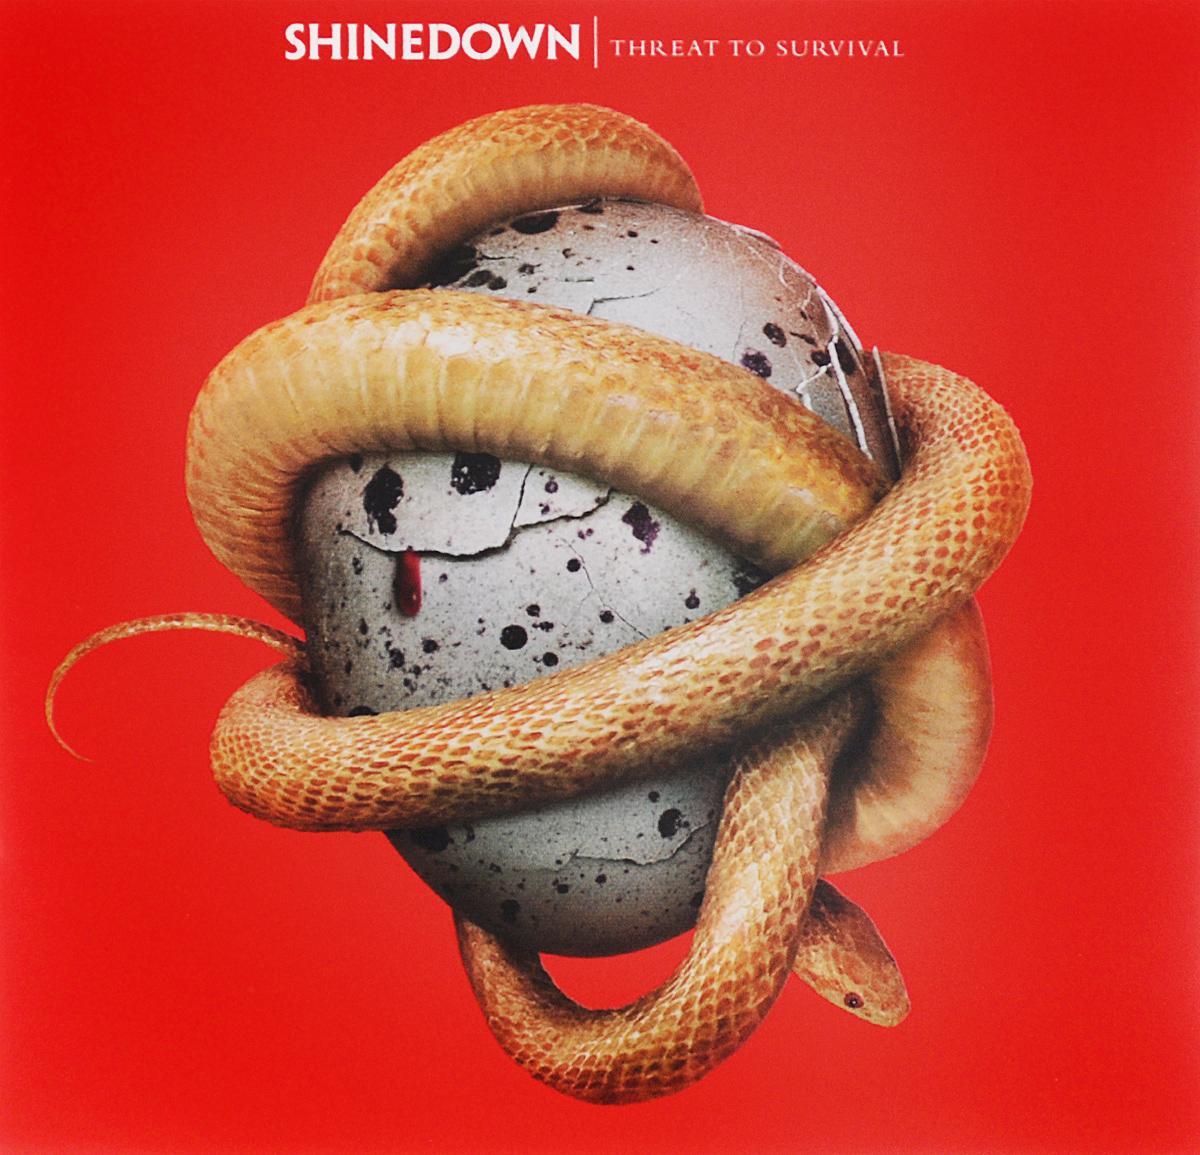 цена на Shinedown Shinedown. Threat To Survival